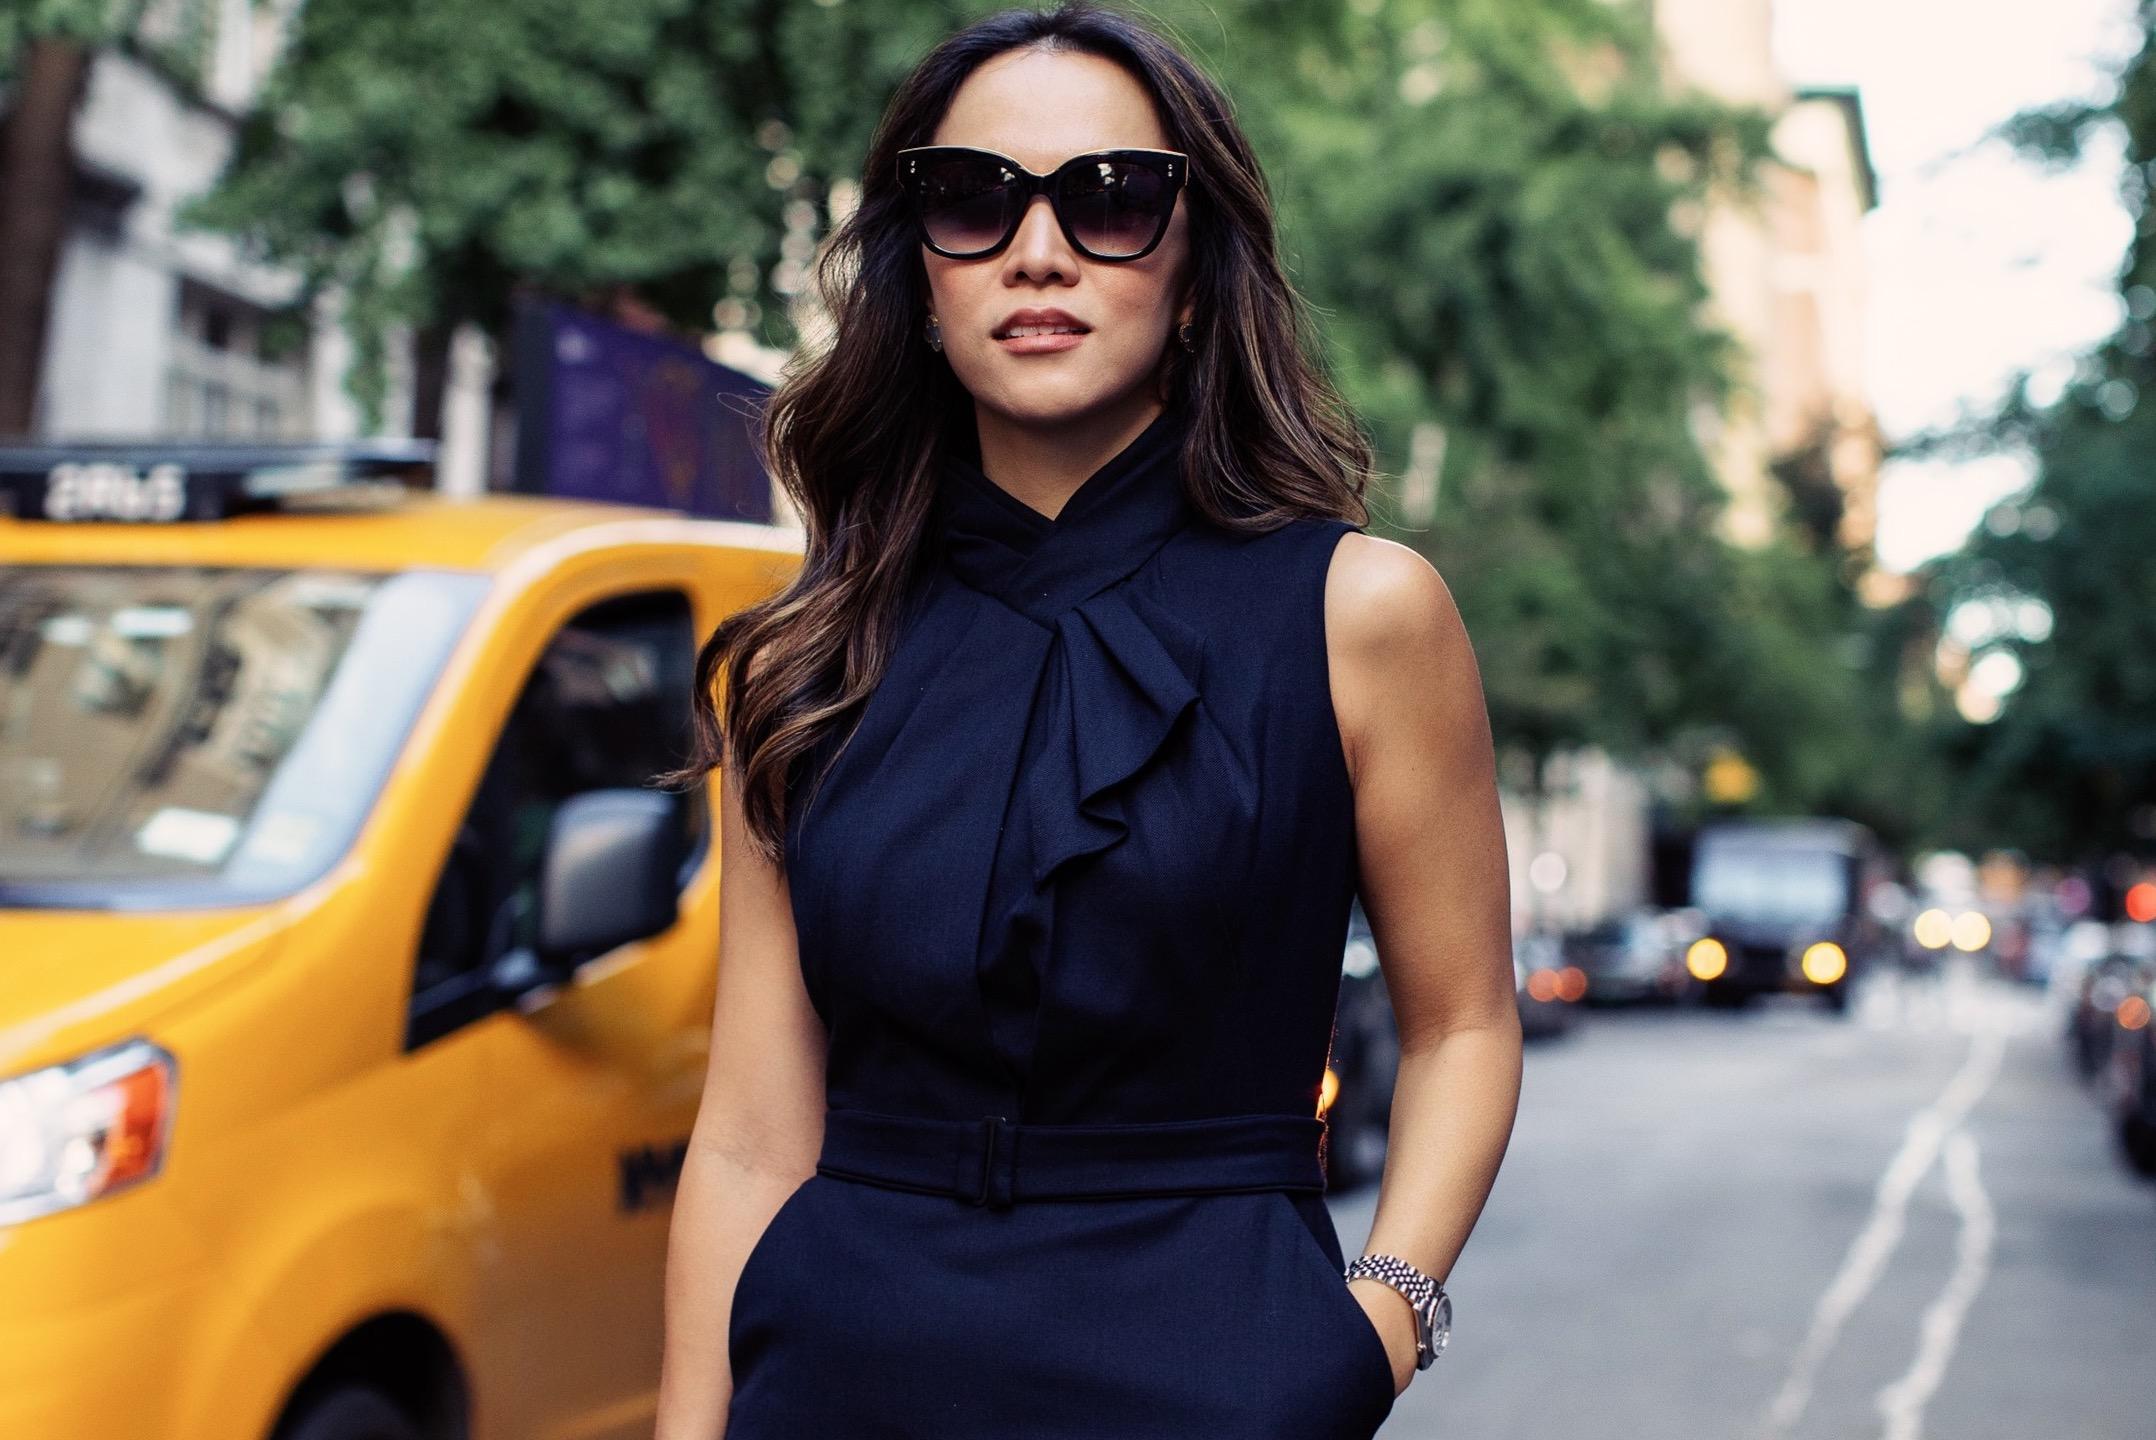 Wall Street Female Executive Says Goodbye To The Traditional 'Male Banker' Suits jessica davis womenontopp women on Topp womenontopp.com